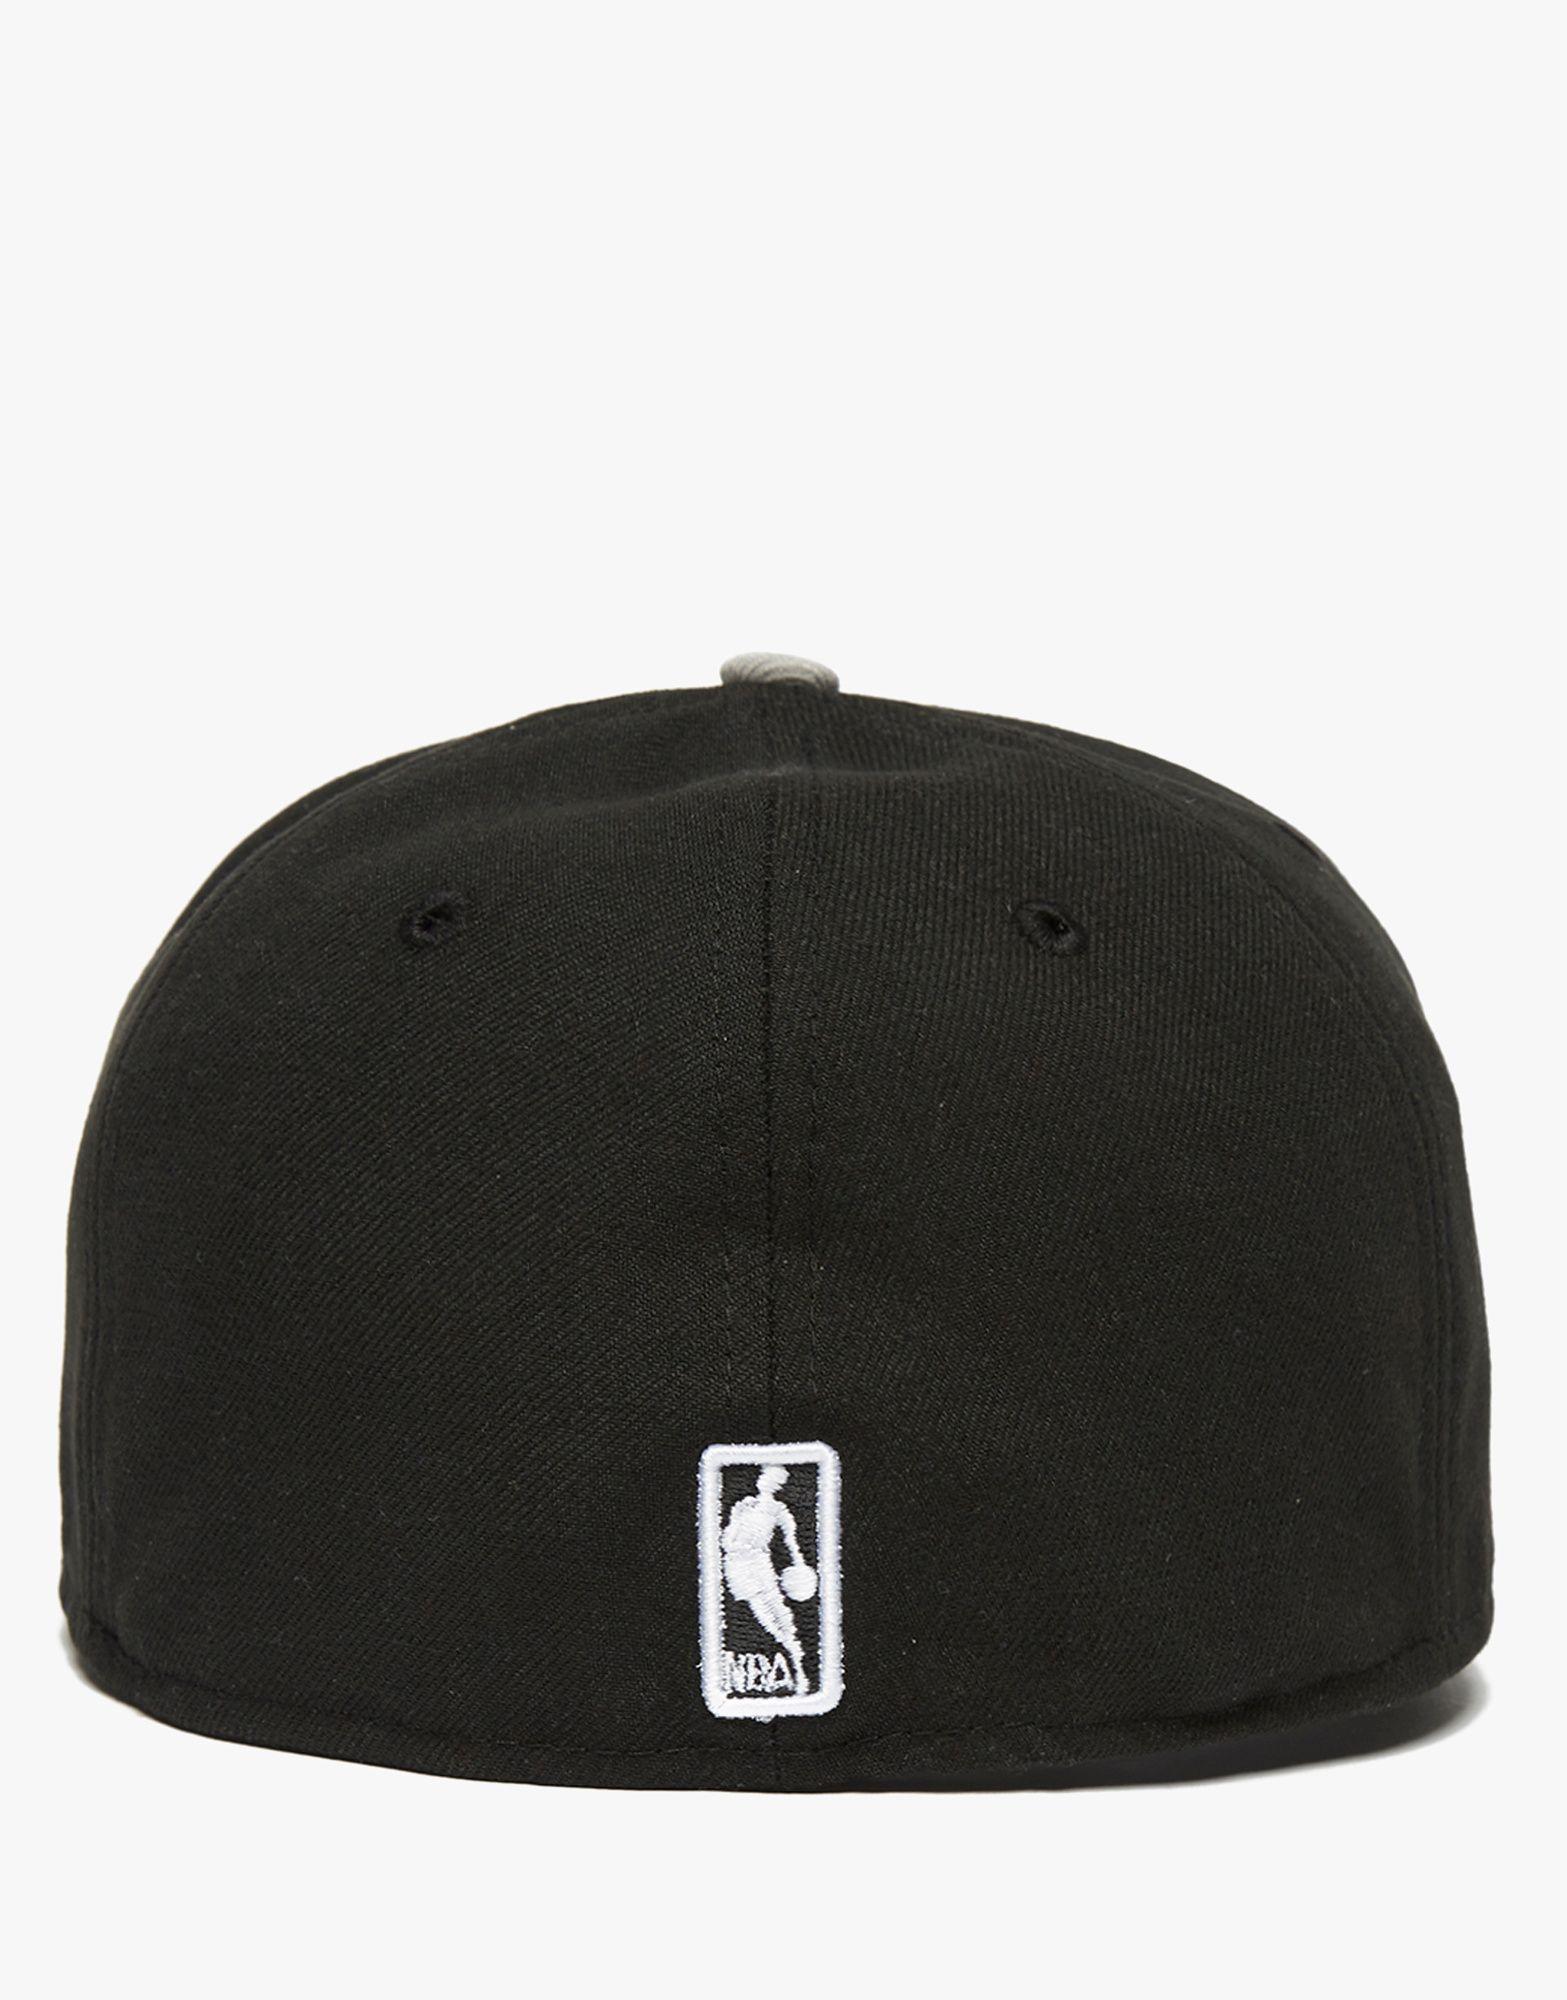 New Era NBA Brooklyn Nets Vizasketch 59FIFTY Cap